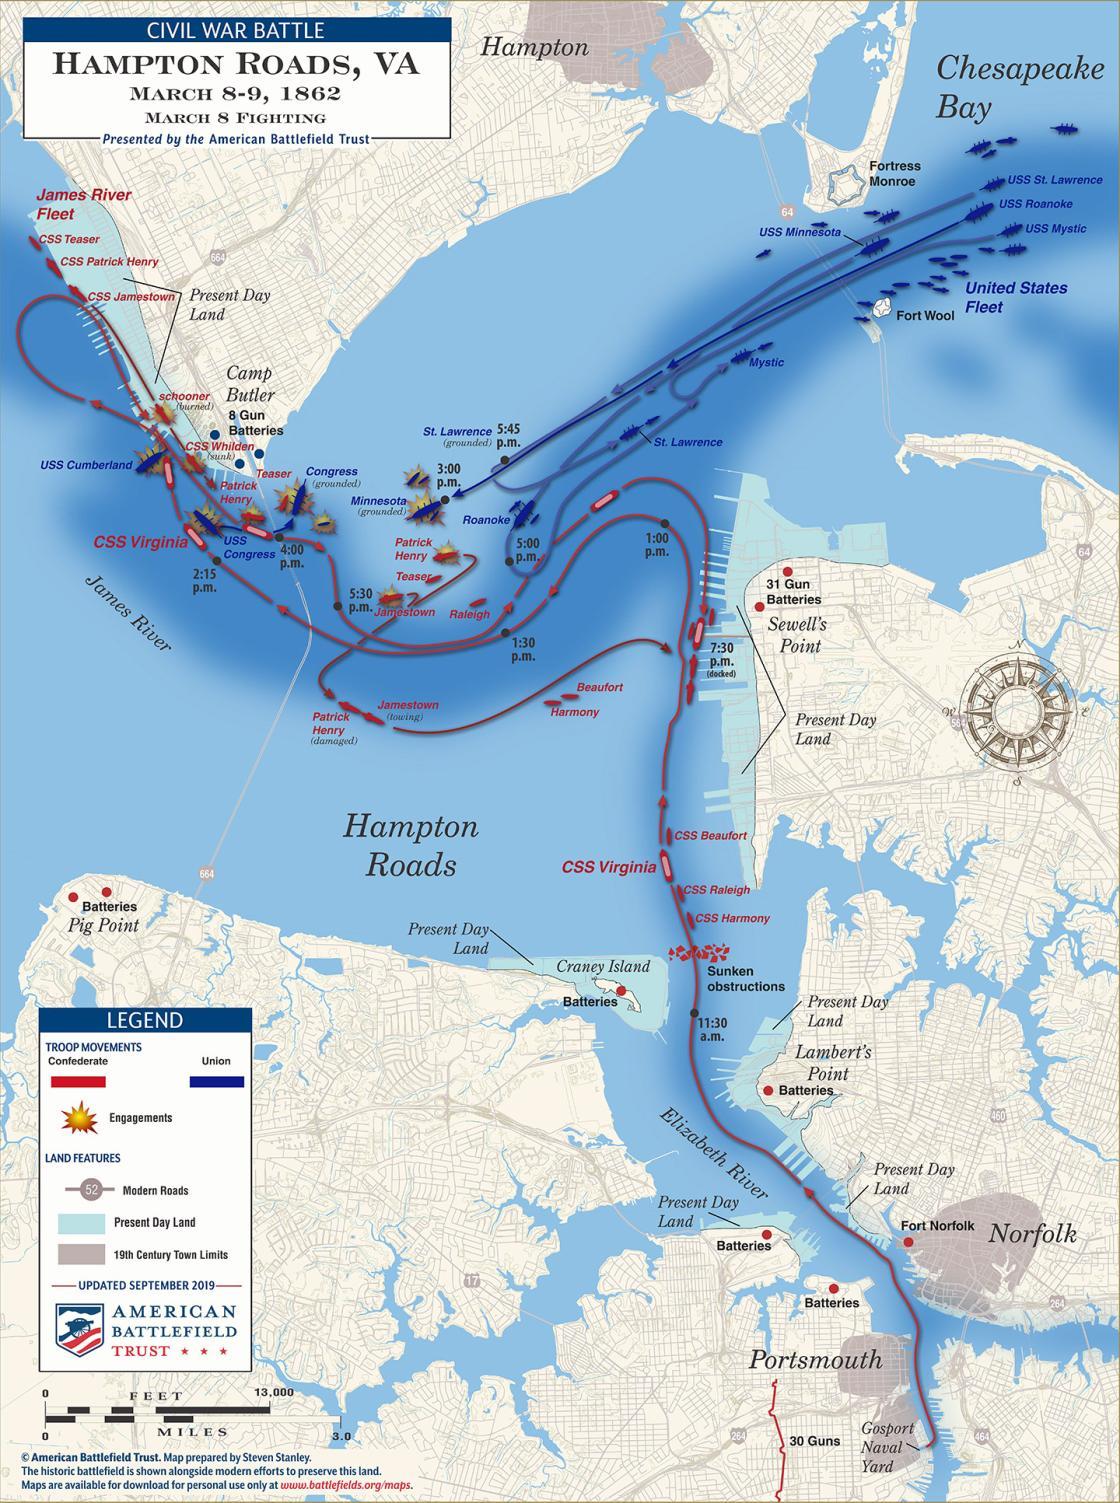 Hampton Roads - March 8, 1862 (September 2019)